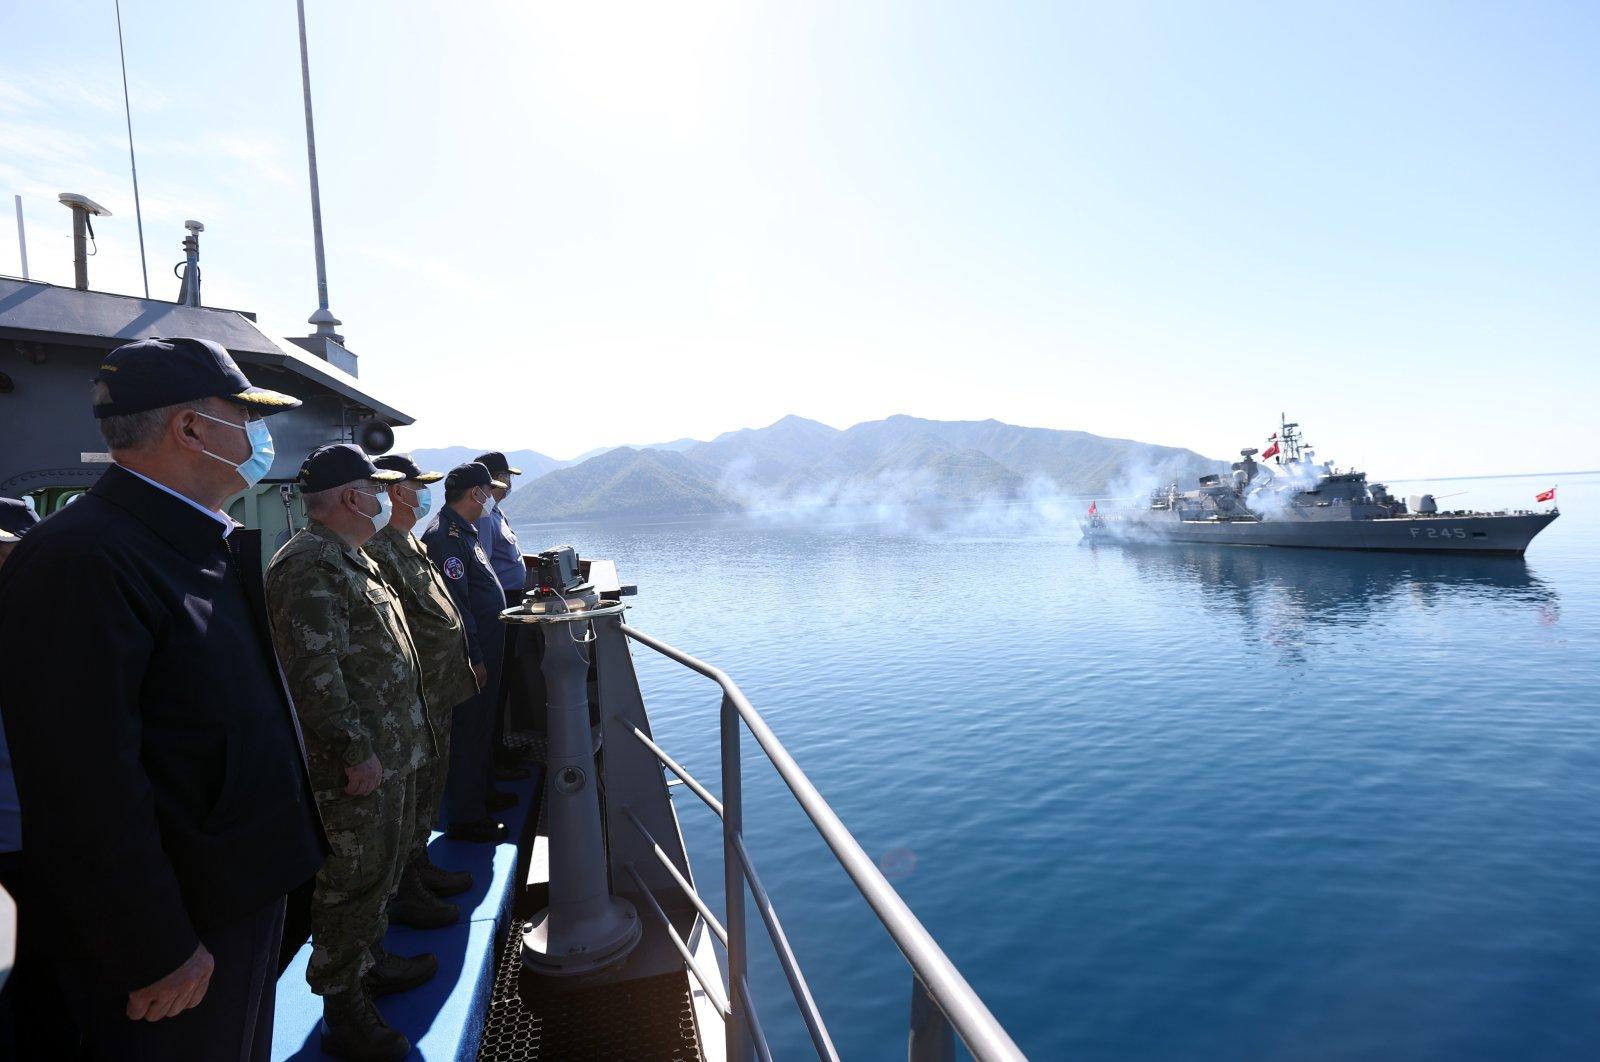 Turkish Defense Minister Hulusi Akar and the command echelon of the Turkish Armed Forces (TSK) observe the Sea Wolf (Denizkurdu) military drill off Marmaris, Muğla, Turkey, June 4, 2021. (AA Photo)